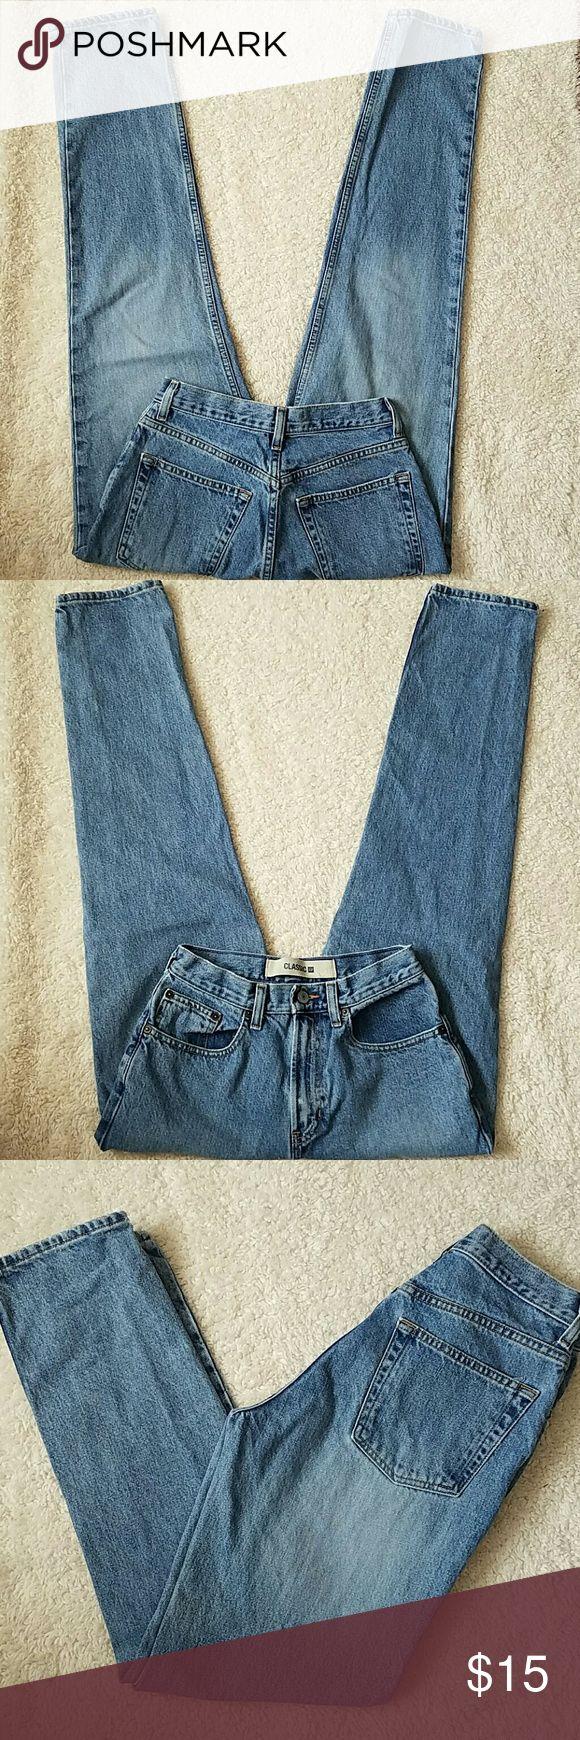 CLASSIC GAP JEANS CLASSIC GAP JEANS 6 REGULAR GAP Jeans Straight Leg